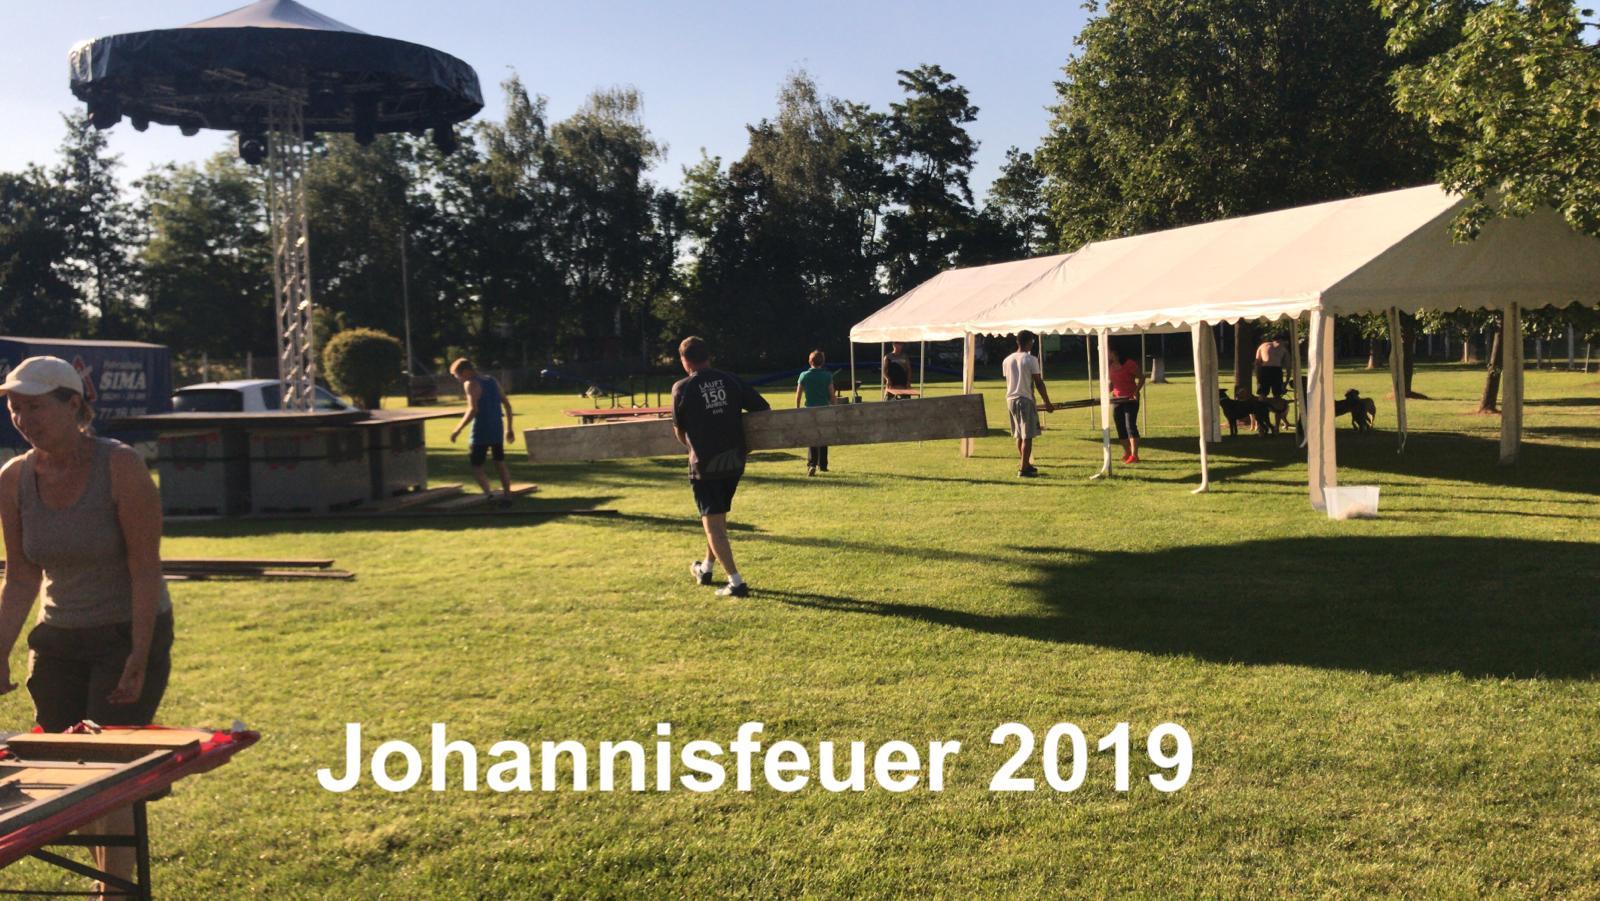 Johannisfeuer 2019